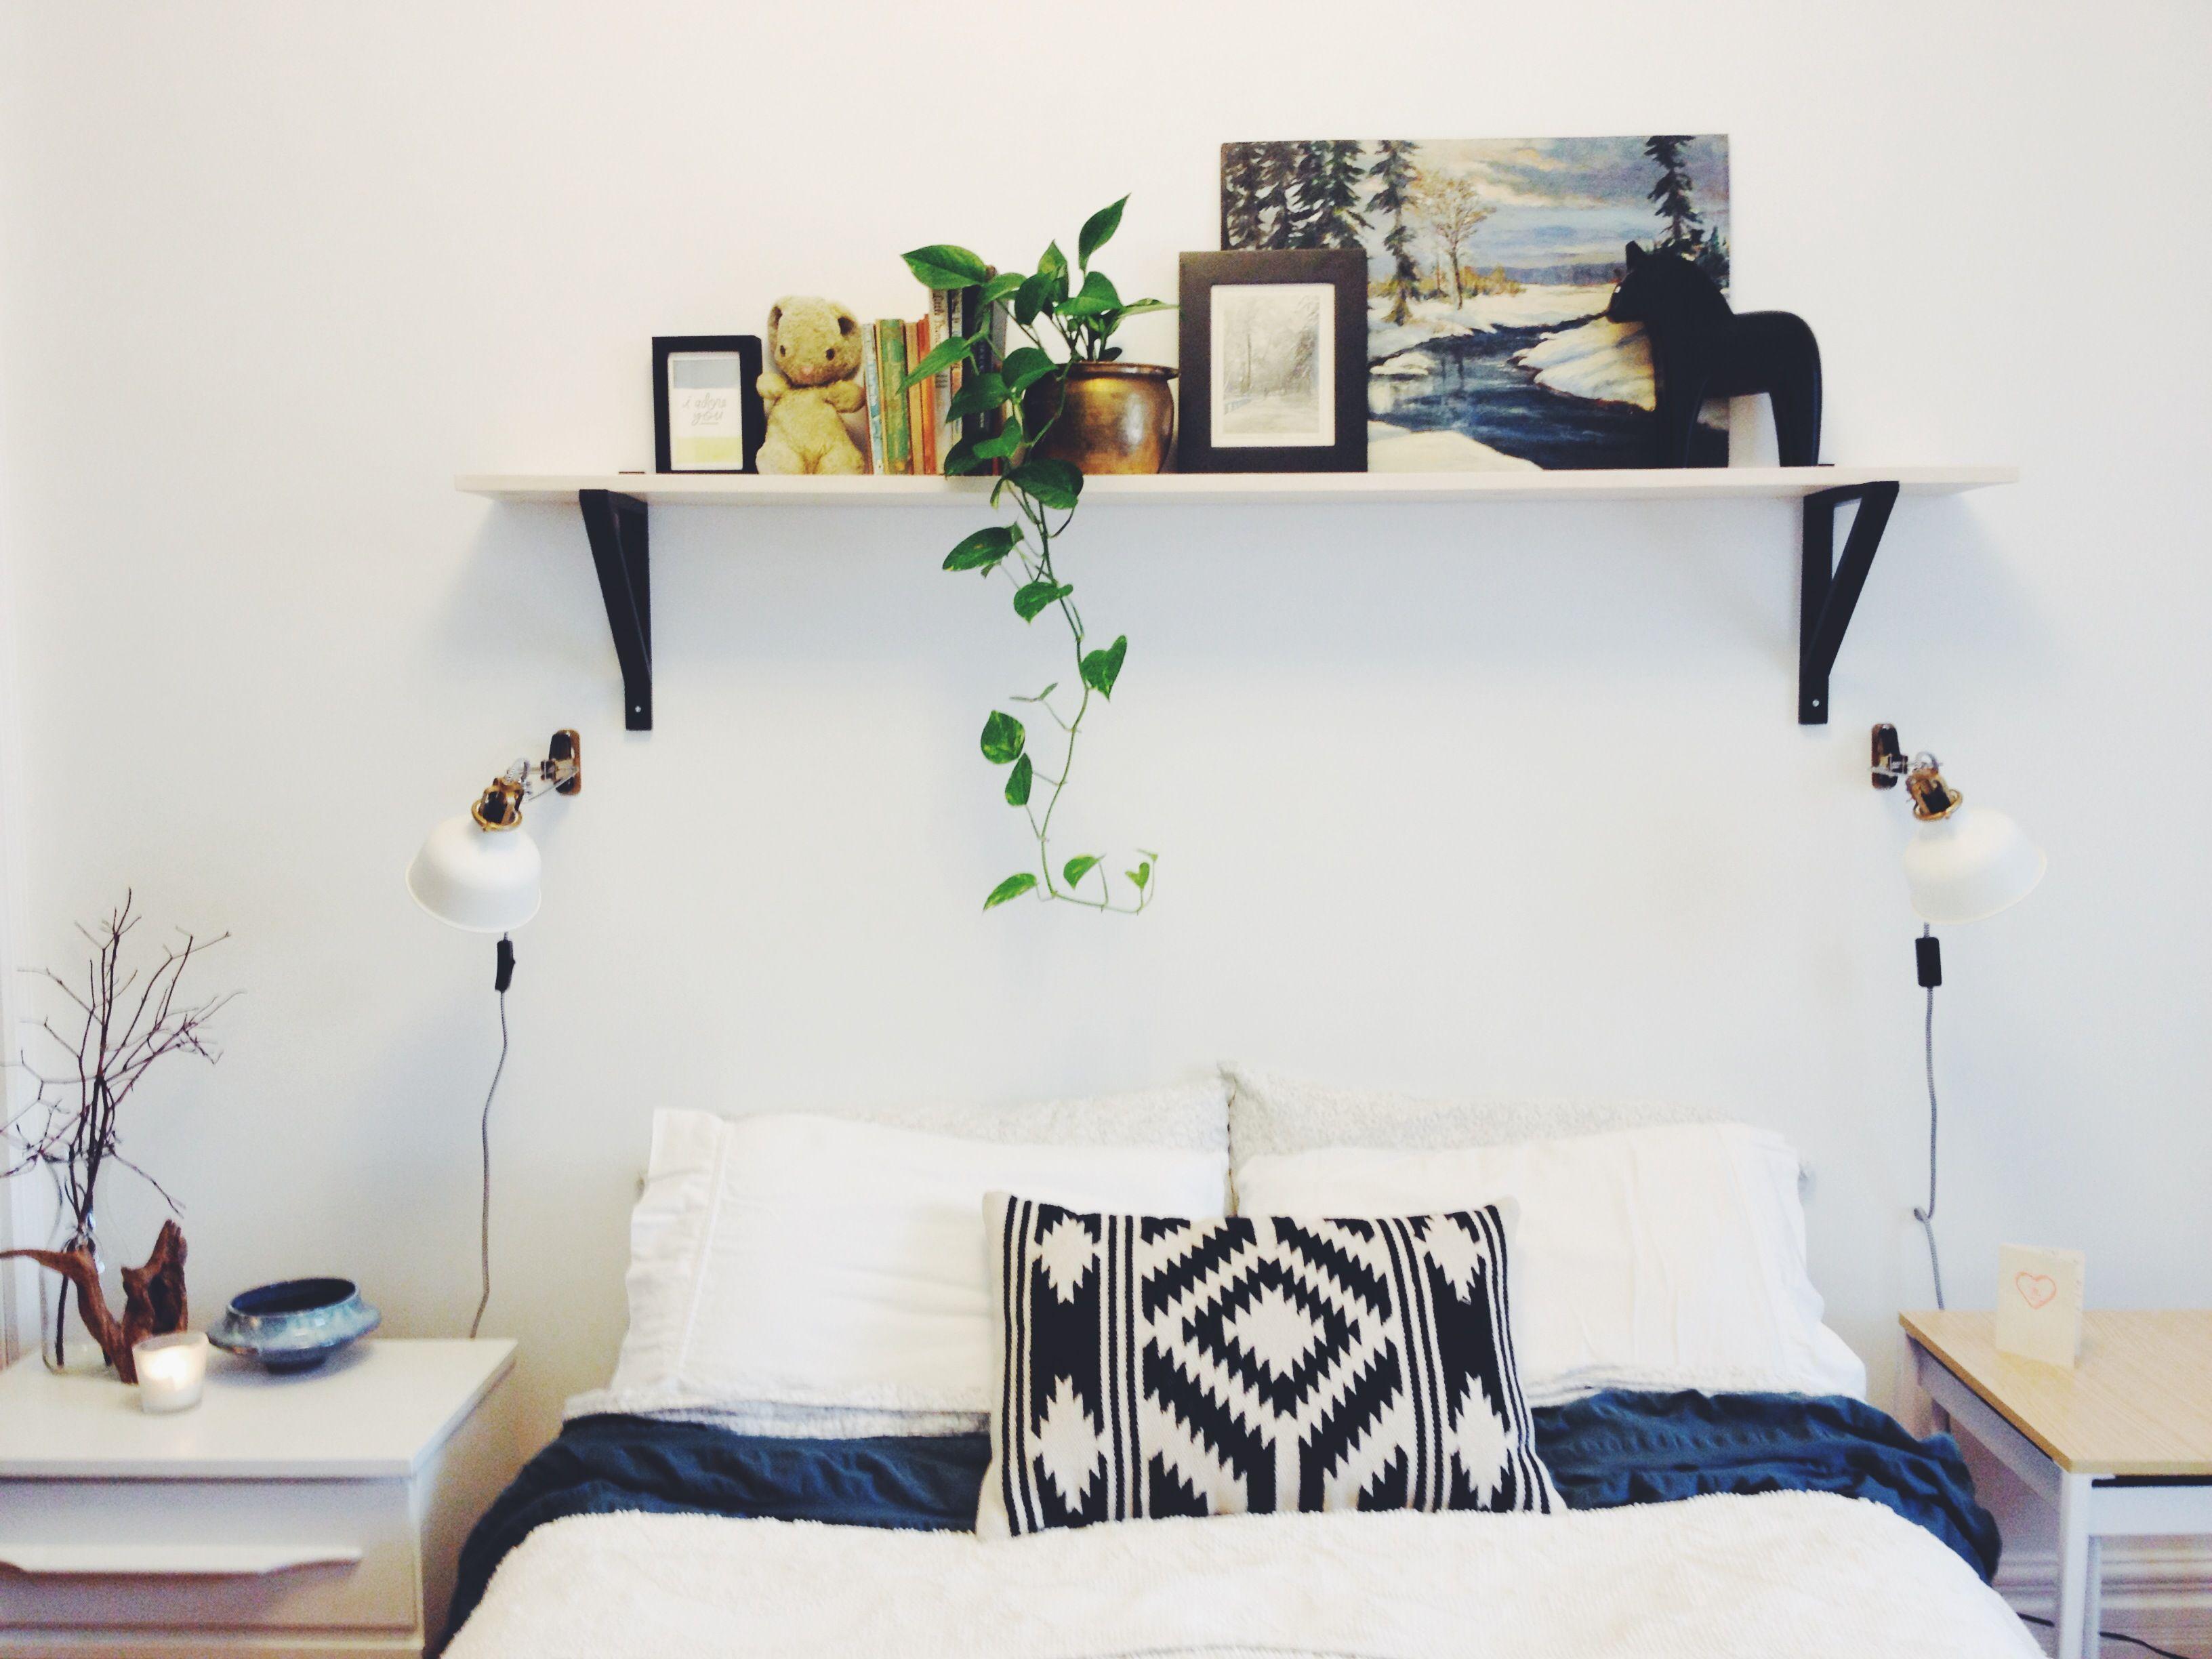 Simple Shelf Over The Bed Row House Nest